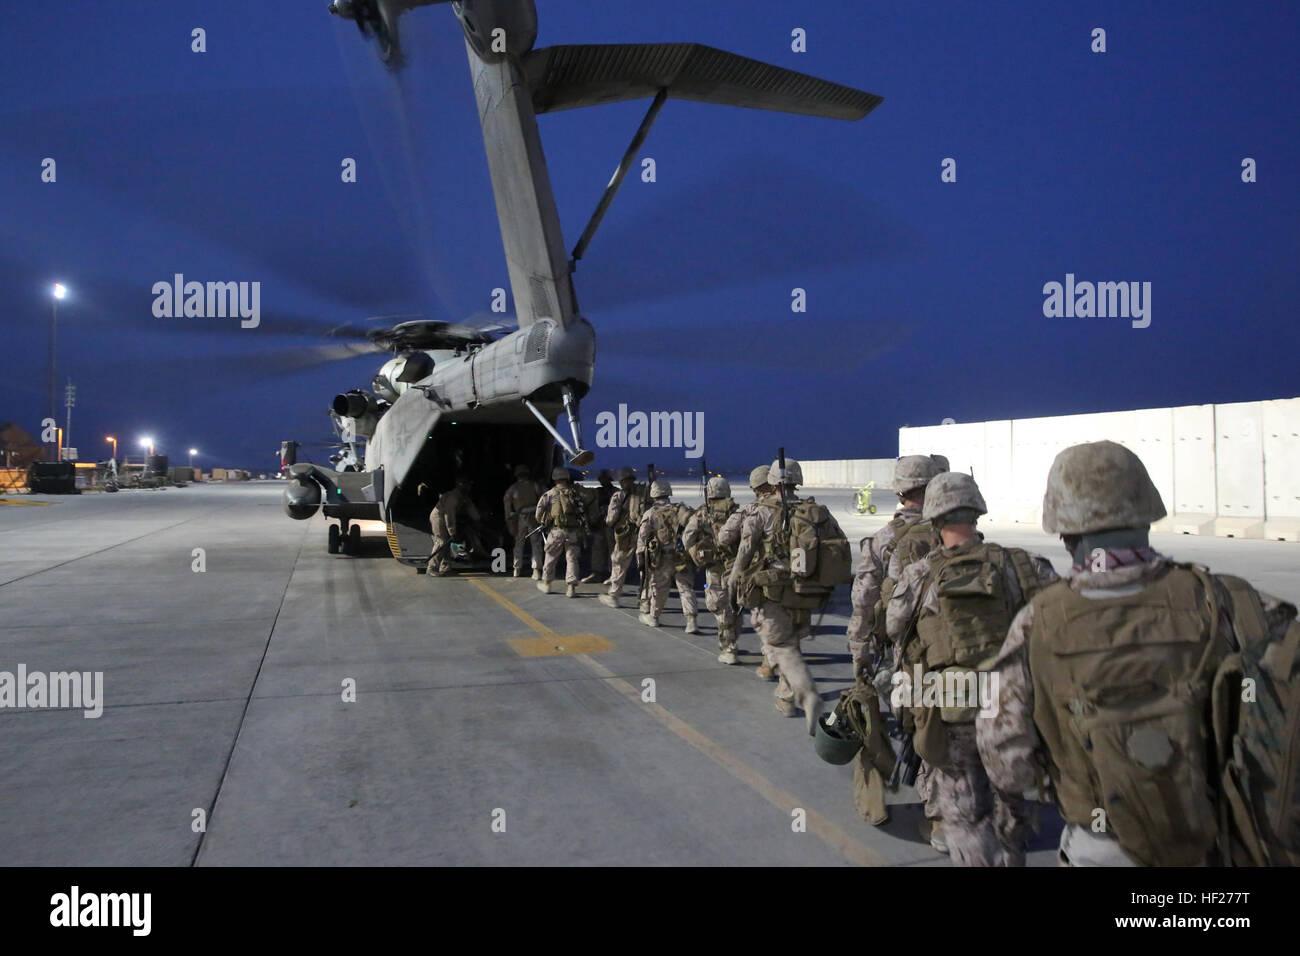 Marines with Bravo Company, 1st Battalion, 7th Marine Regiment, load onto a CH-53E Super Stallion with Marine Heavy - Stock Image